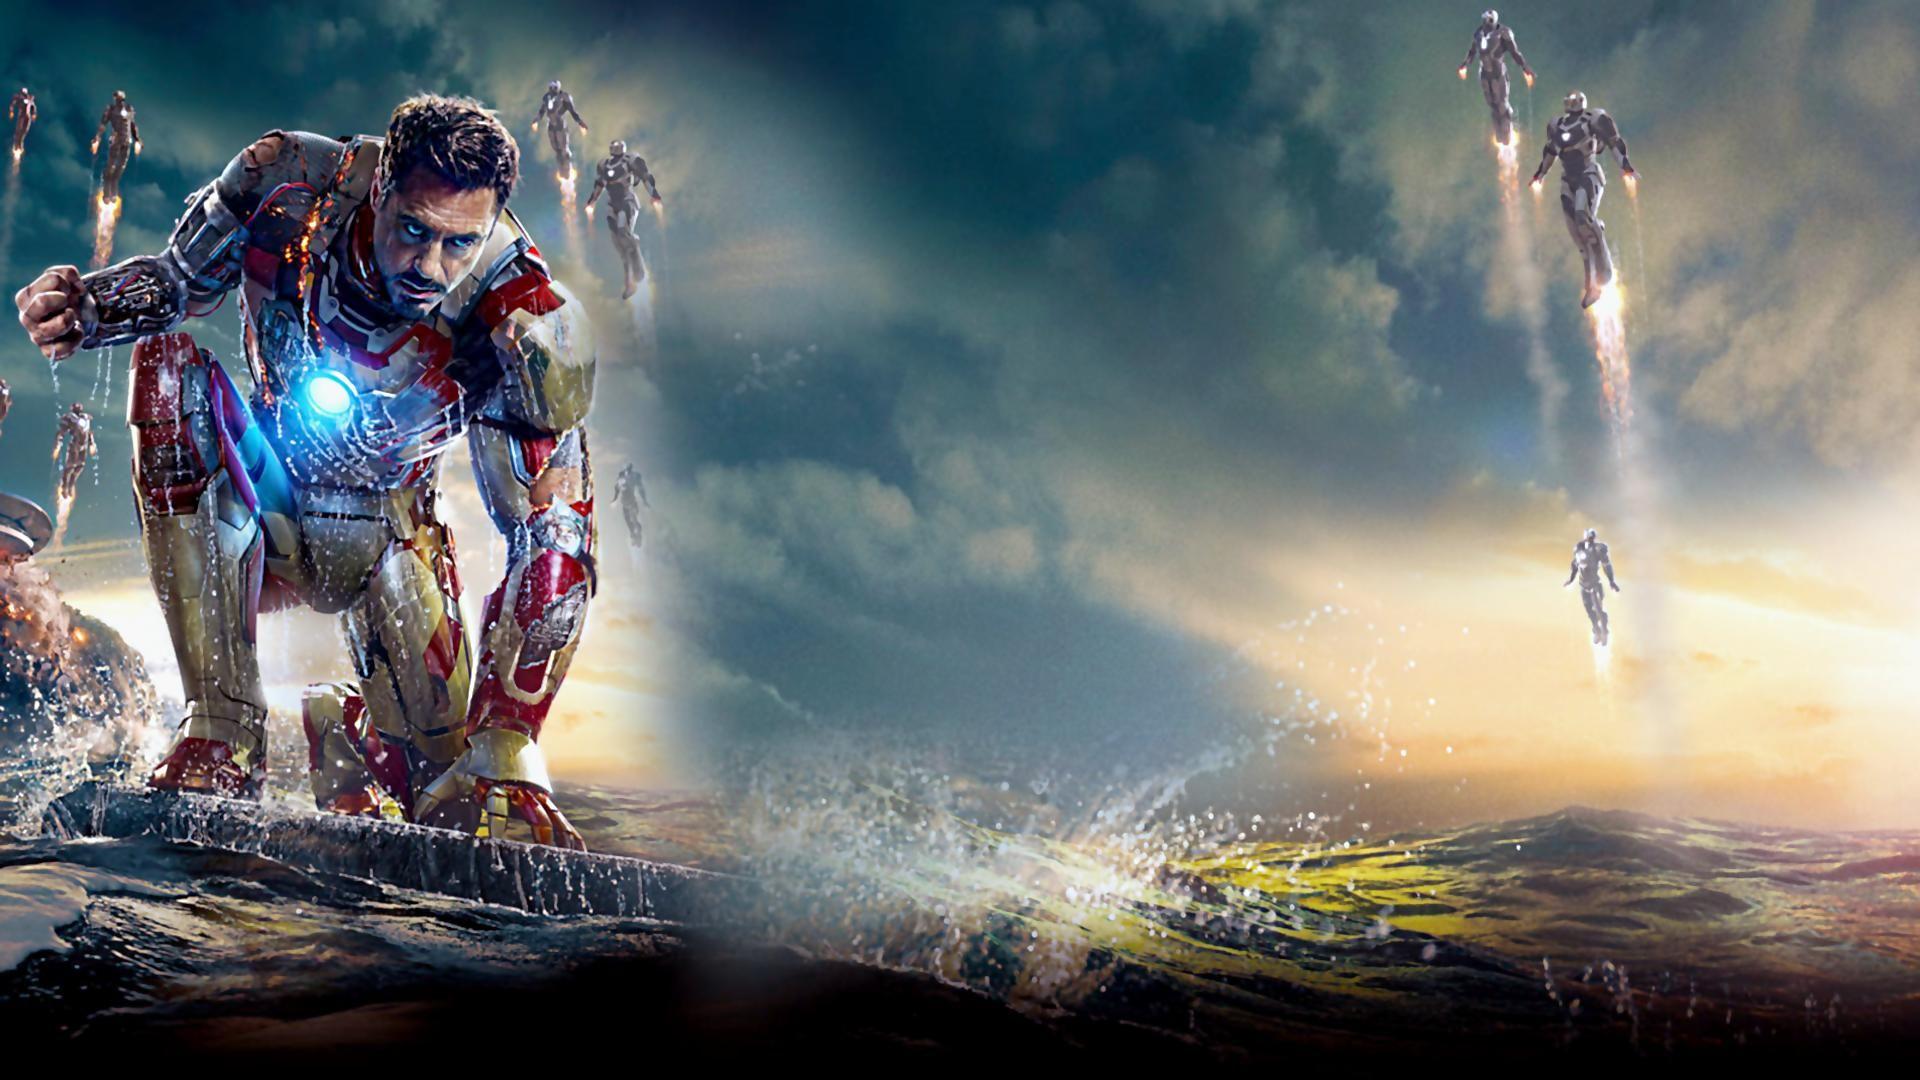 Iron Man Wallpaper 1920 1080 Tela Pc Wallpaper Vingadores